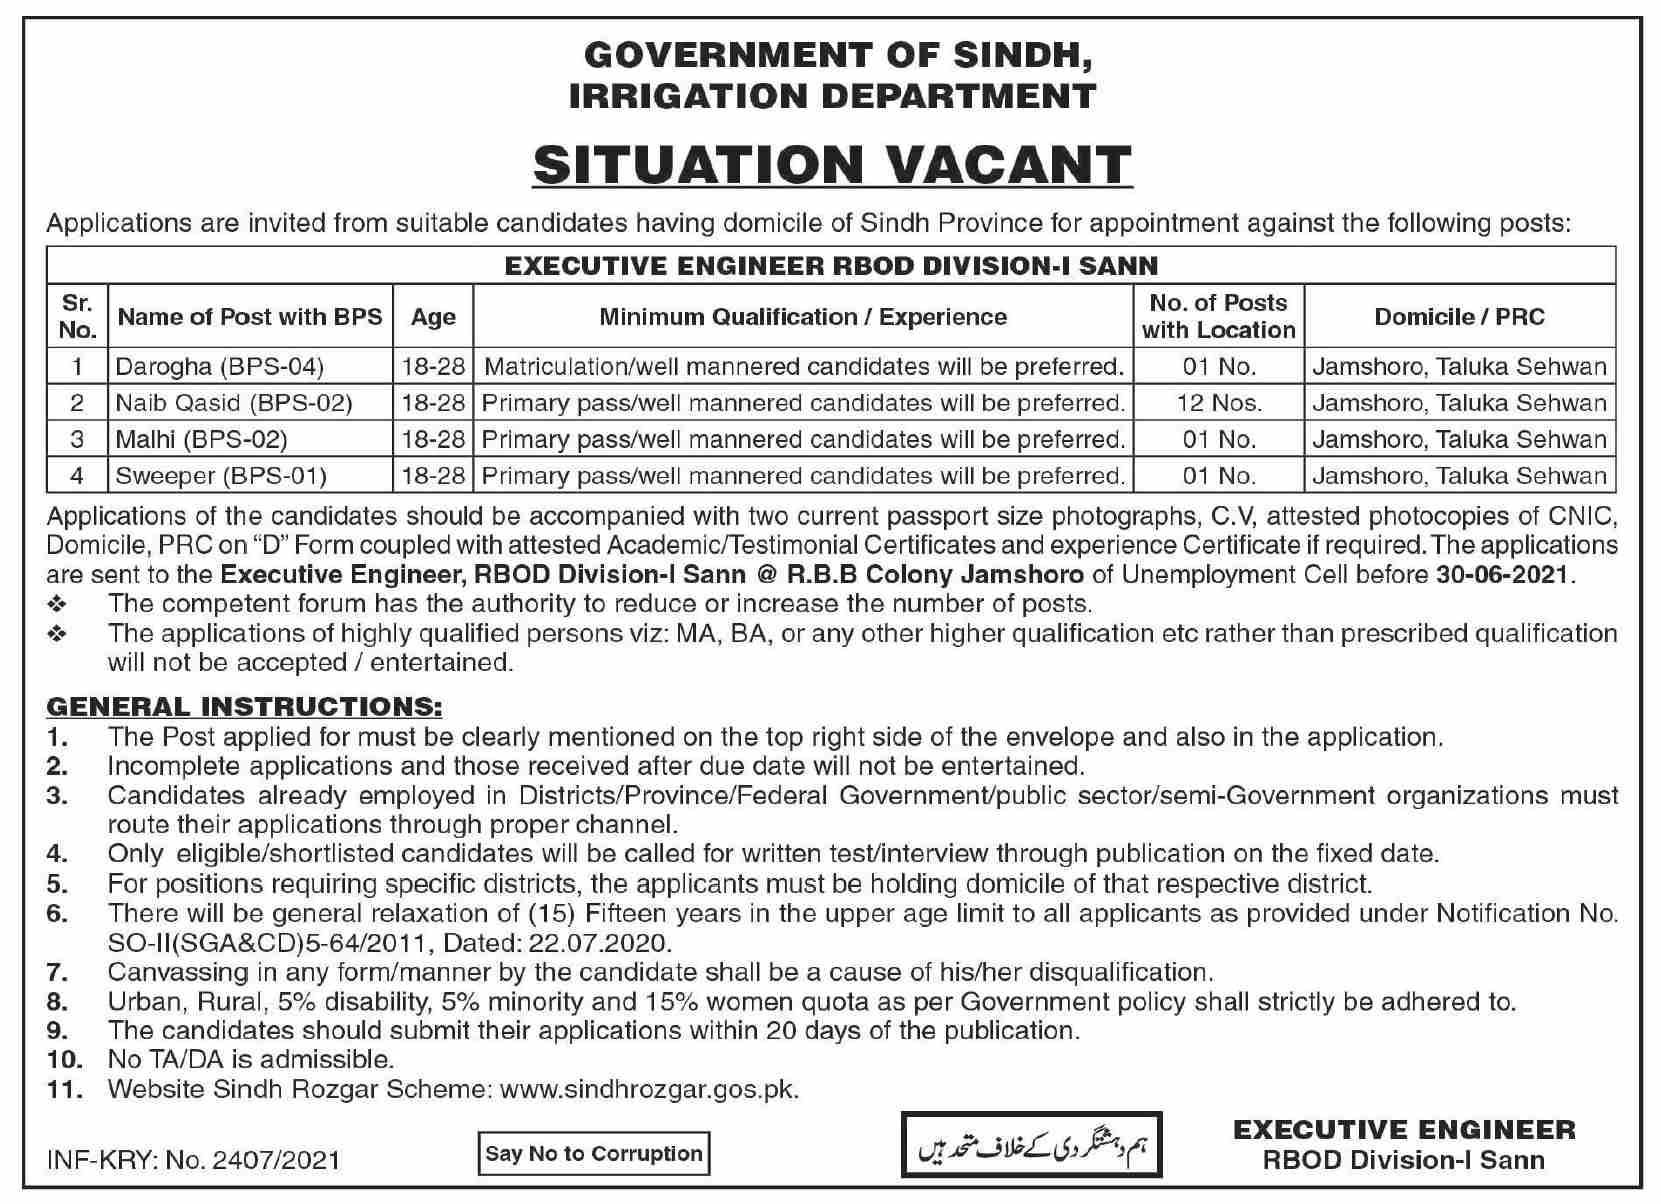 RBOD Division I SANN Irrigation Department Sindh Jobs 2021